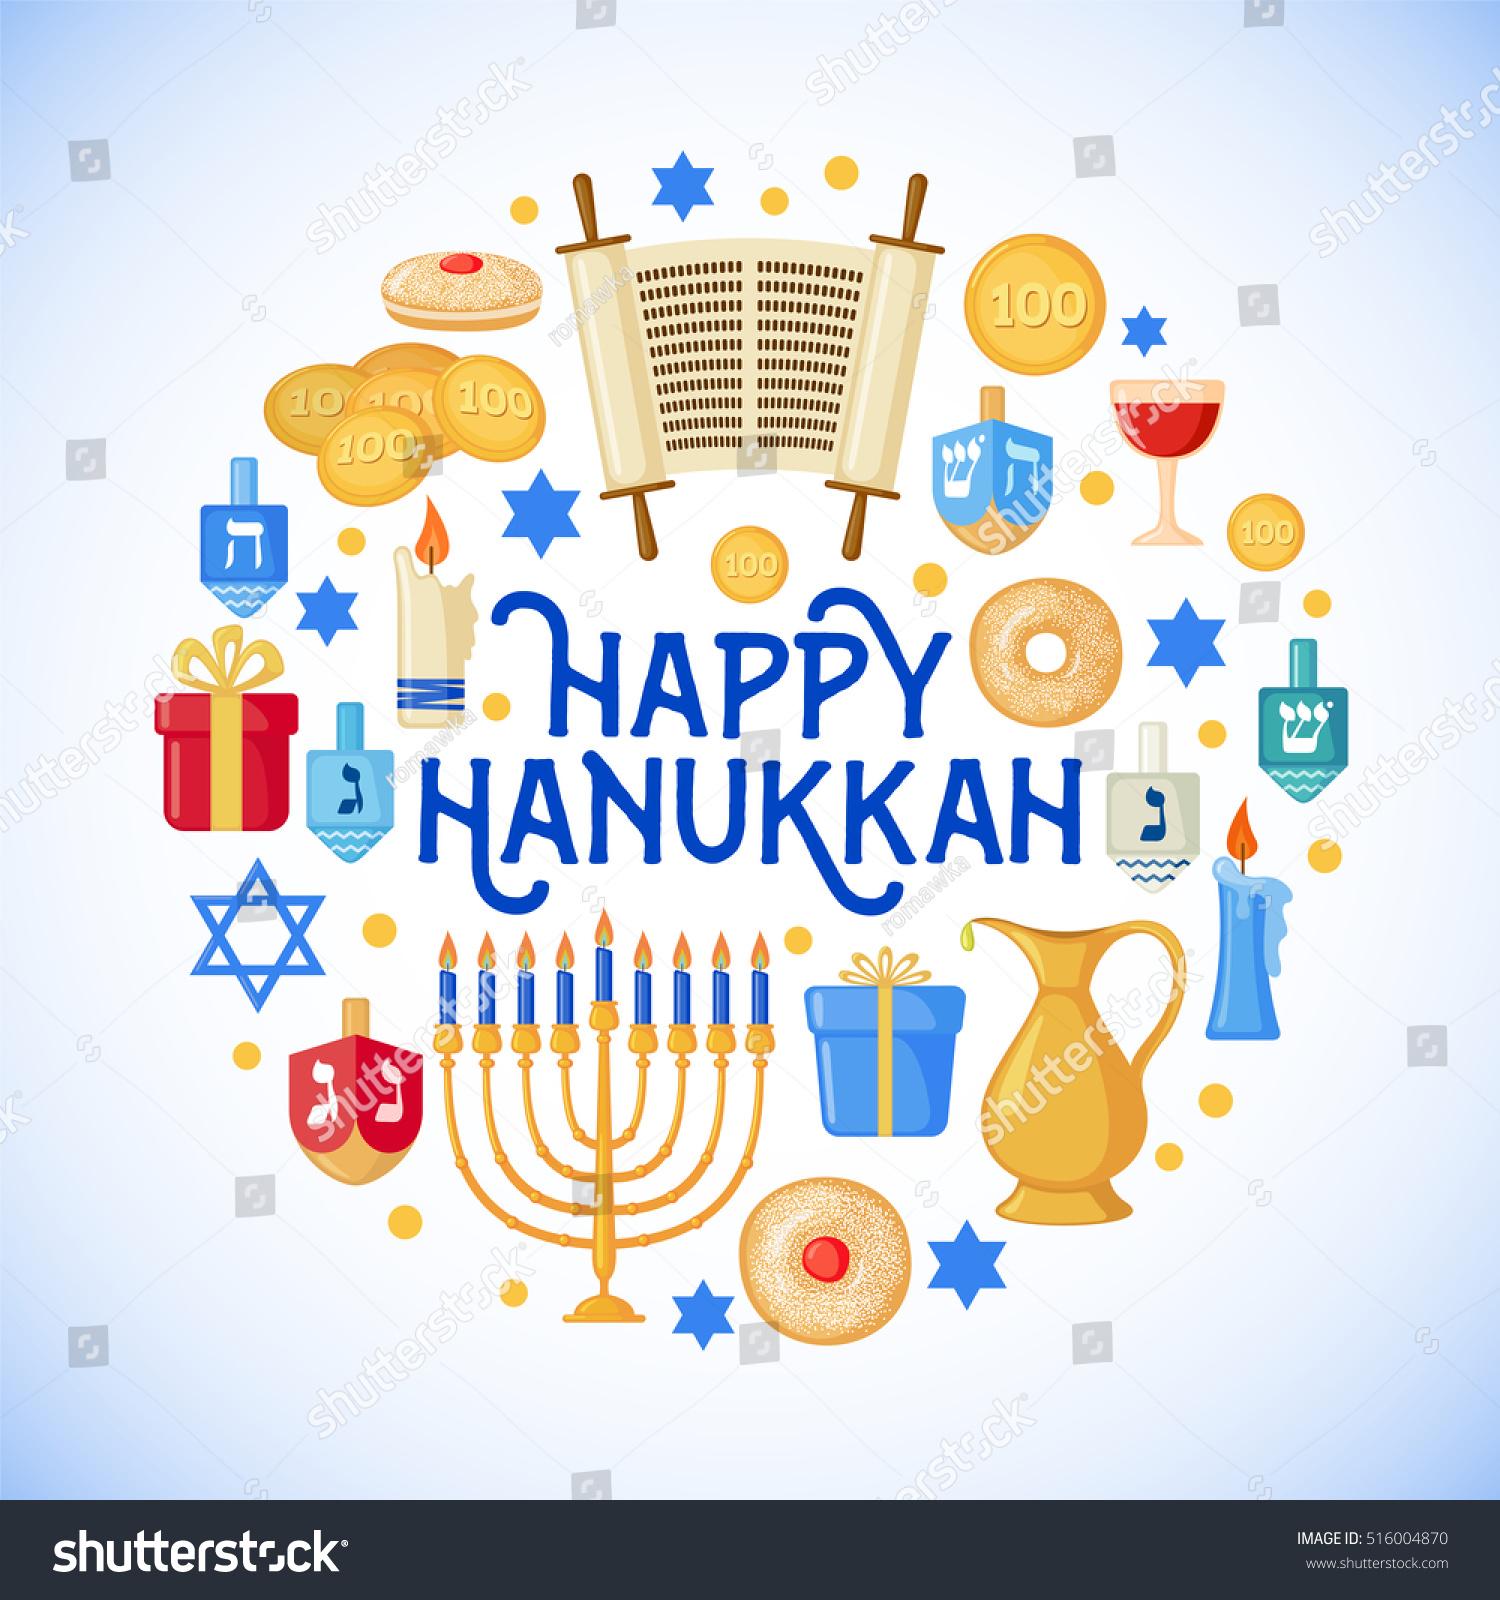 Happy Hanukkah Greeting Card Flat Style Stock Vector 516004870